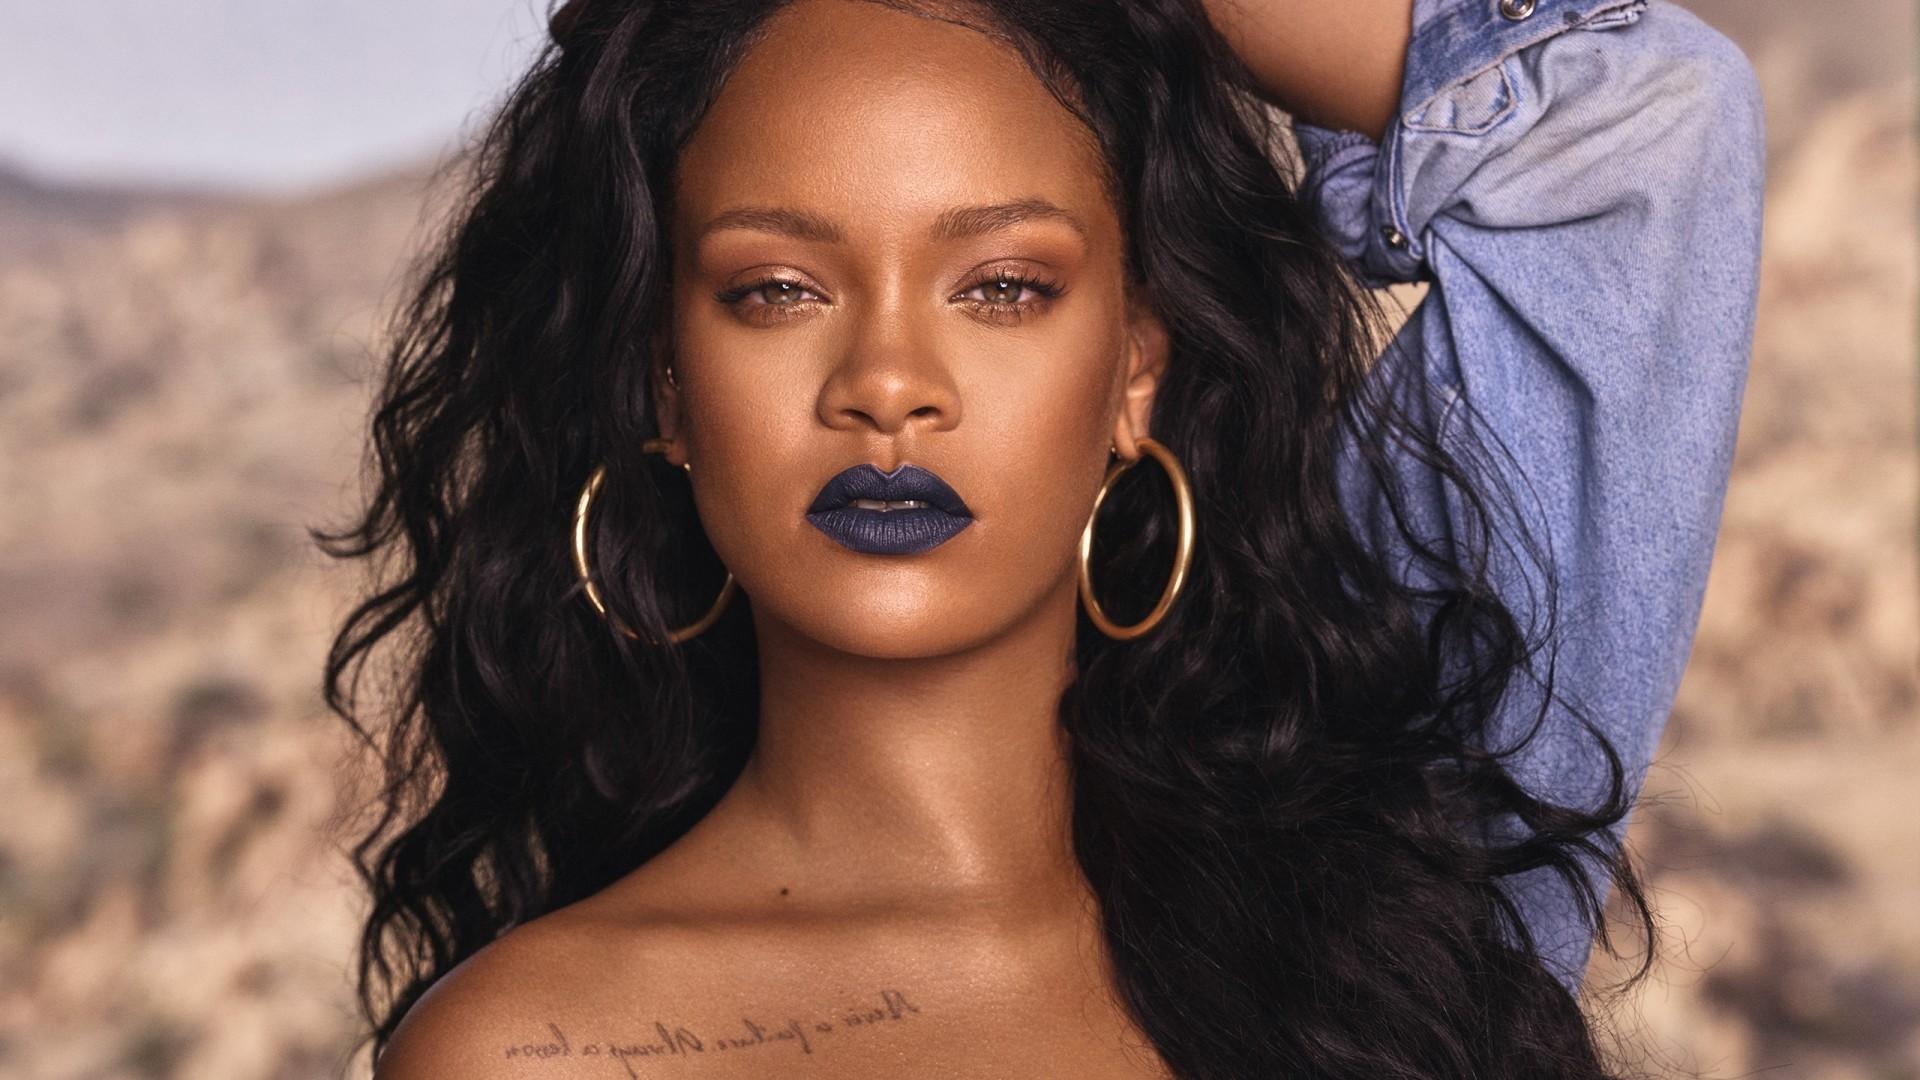 Rihanna hd wallpaper download